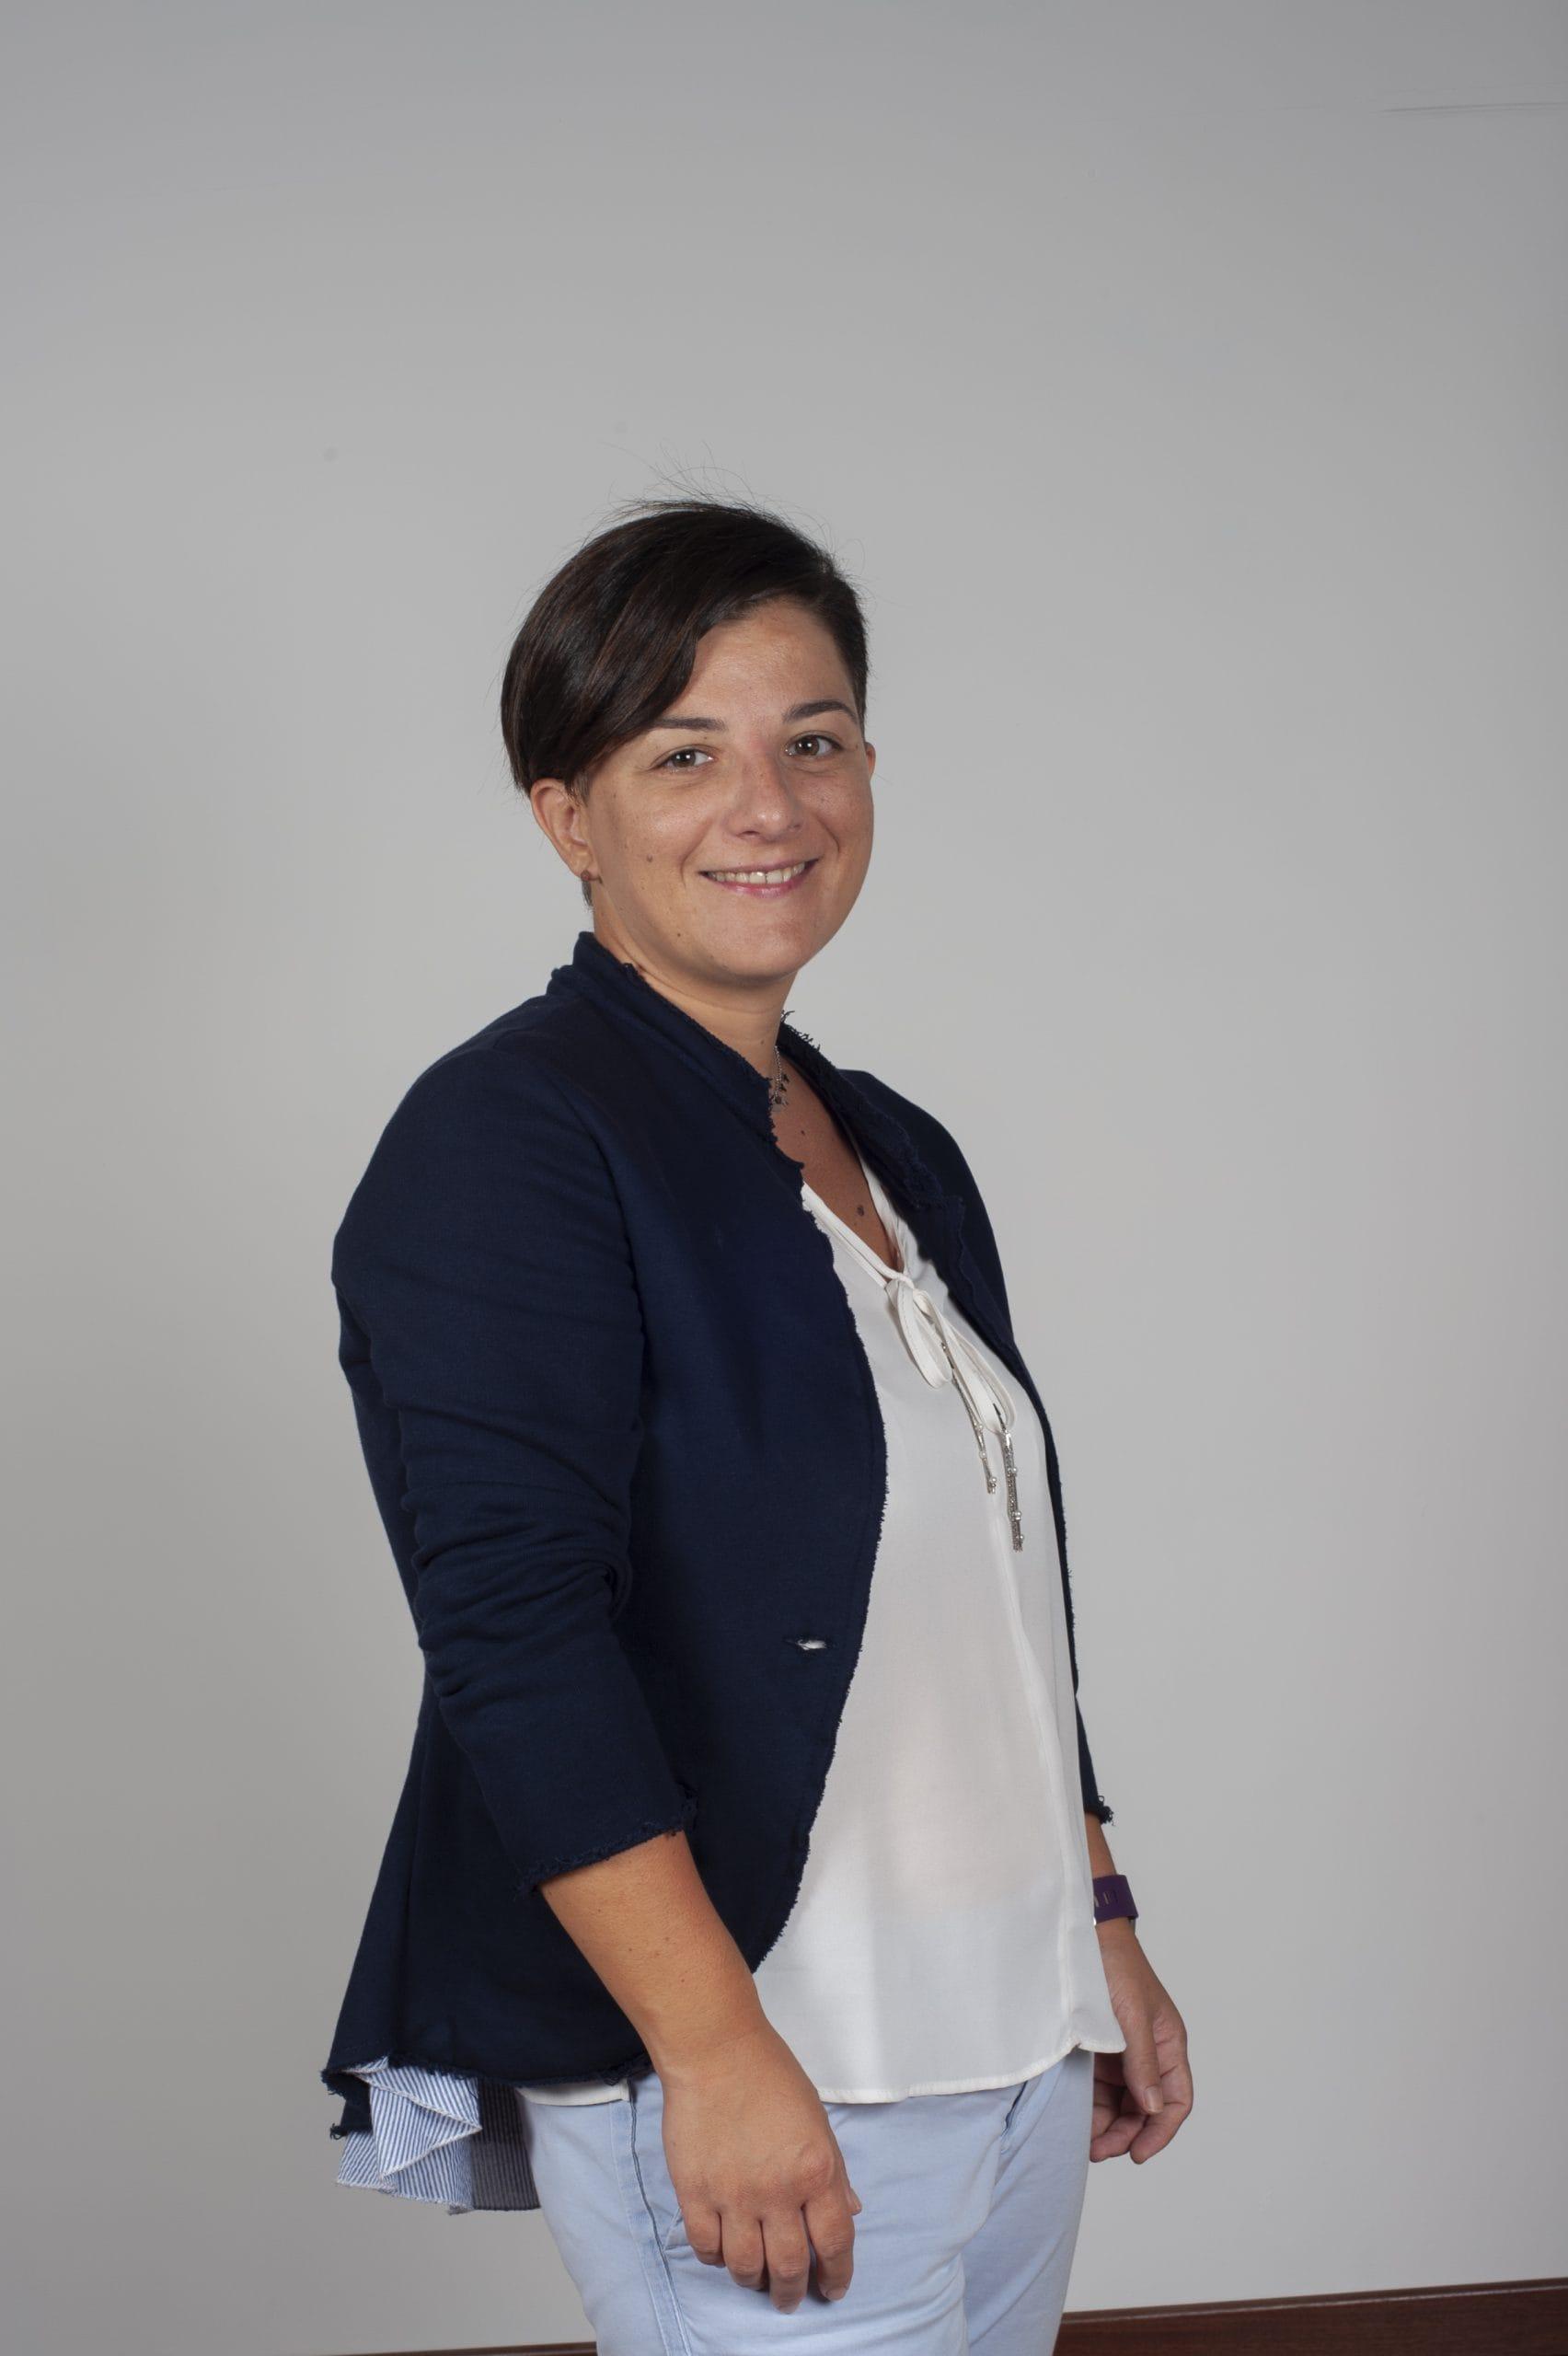 Raffaella Candelora